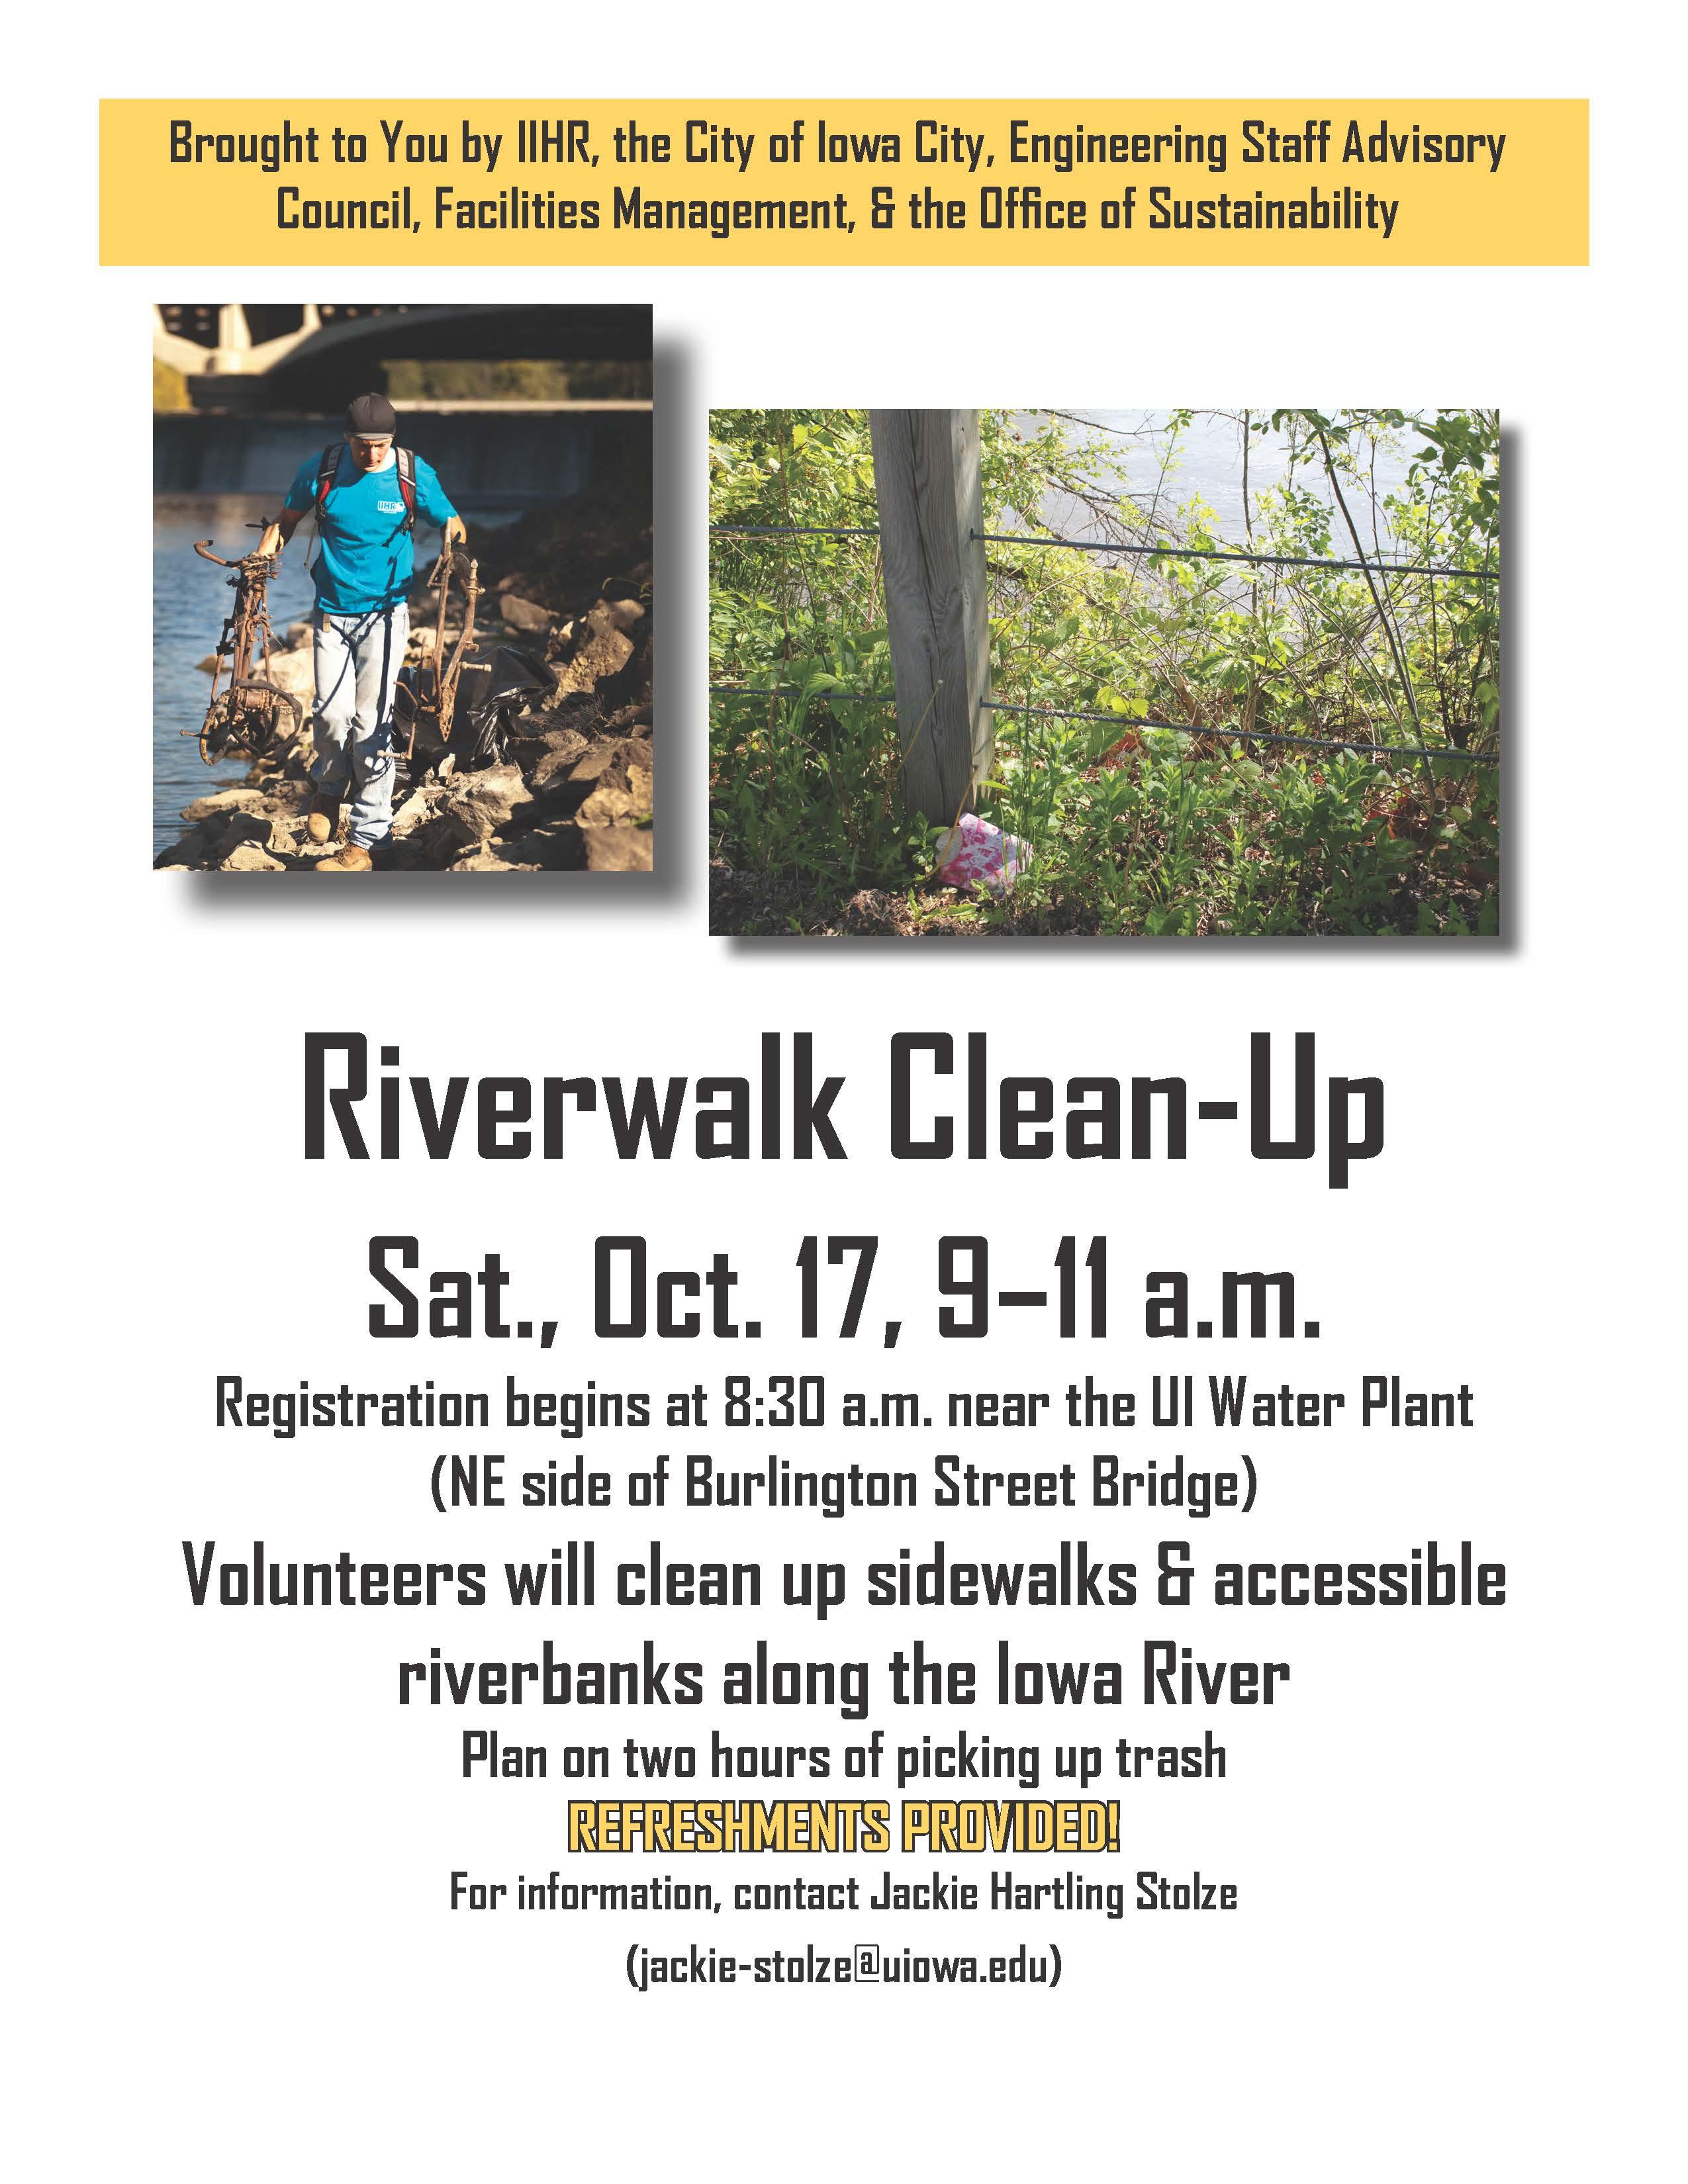 Riverwalk Clean-Up poster.